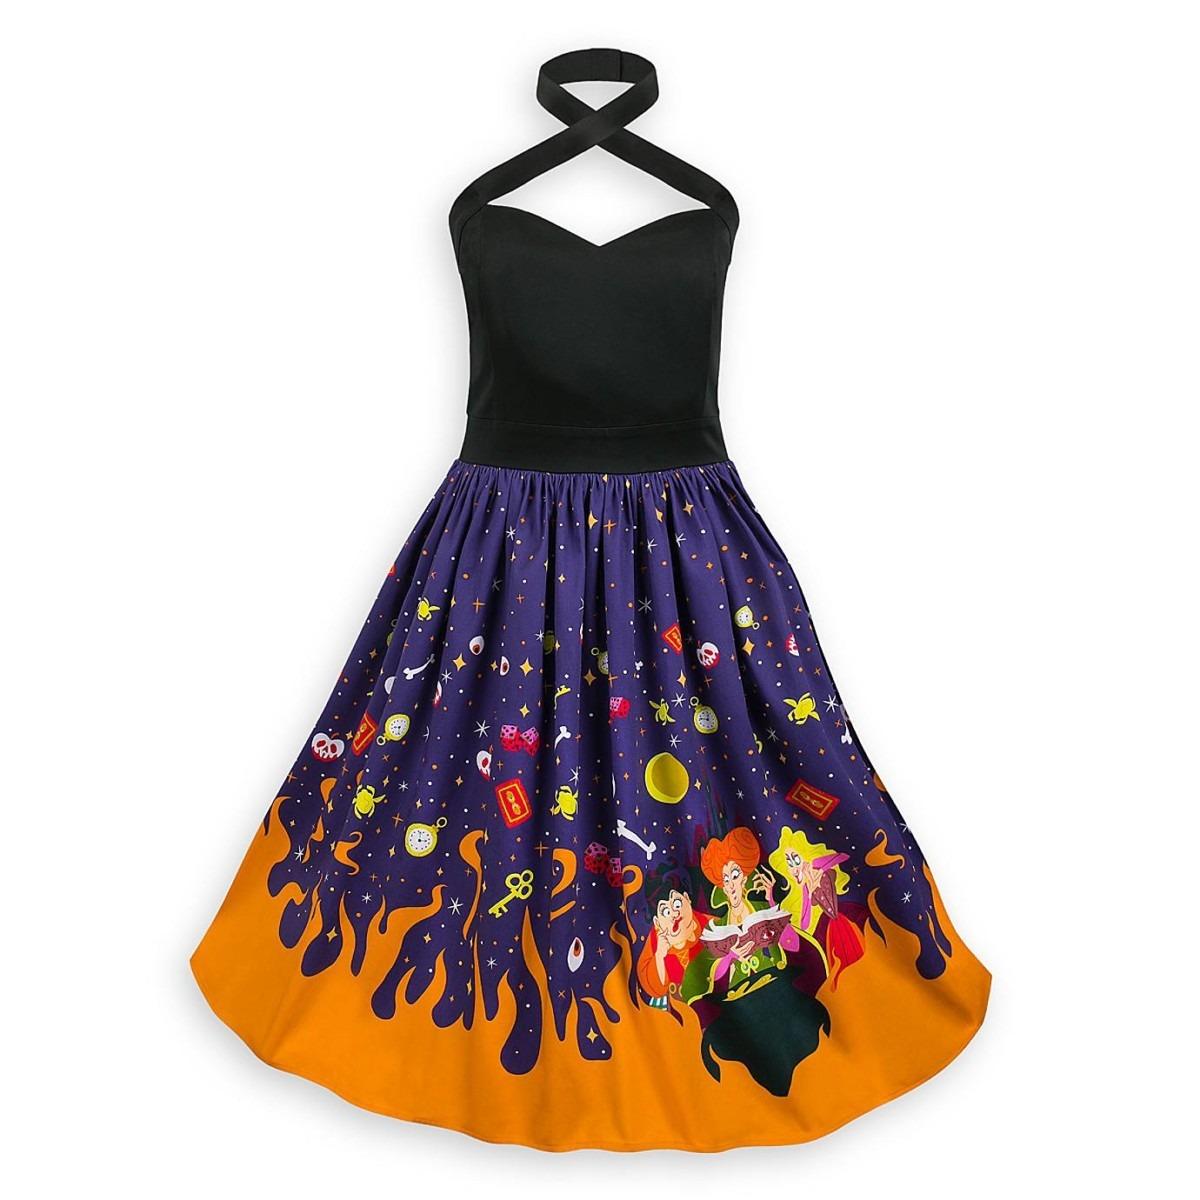 Hocus Pocus Dress for Women